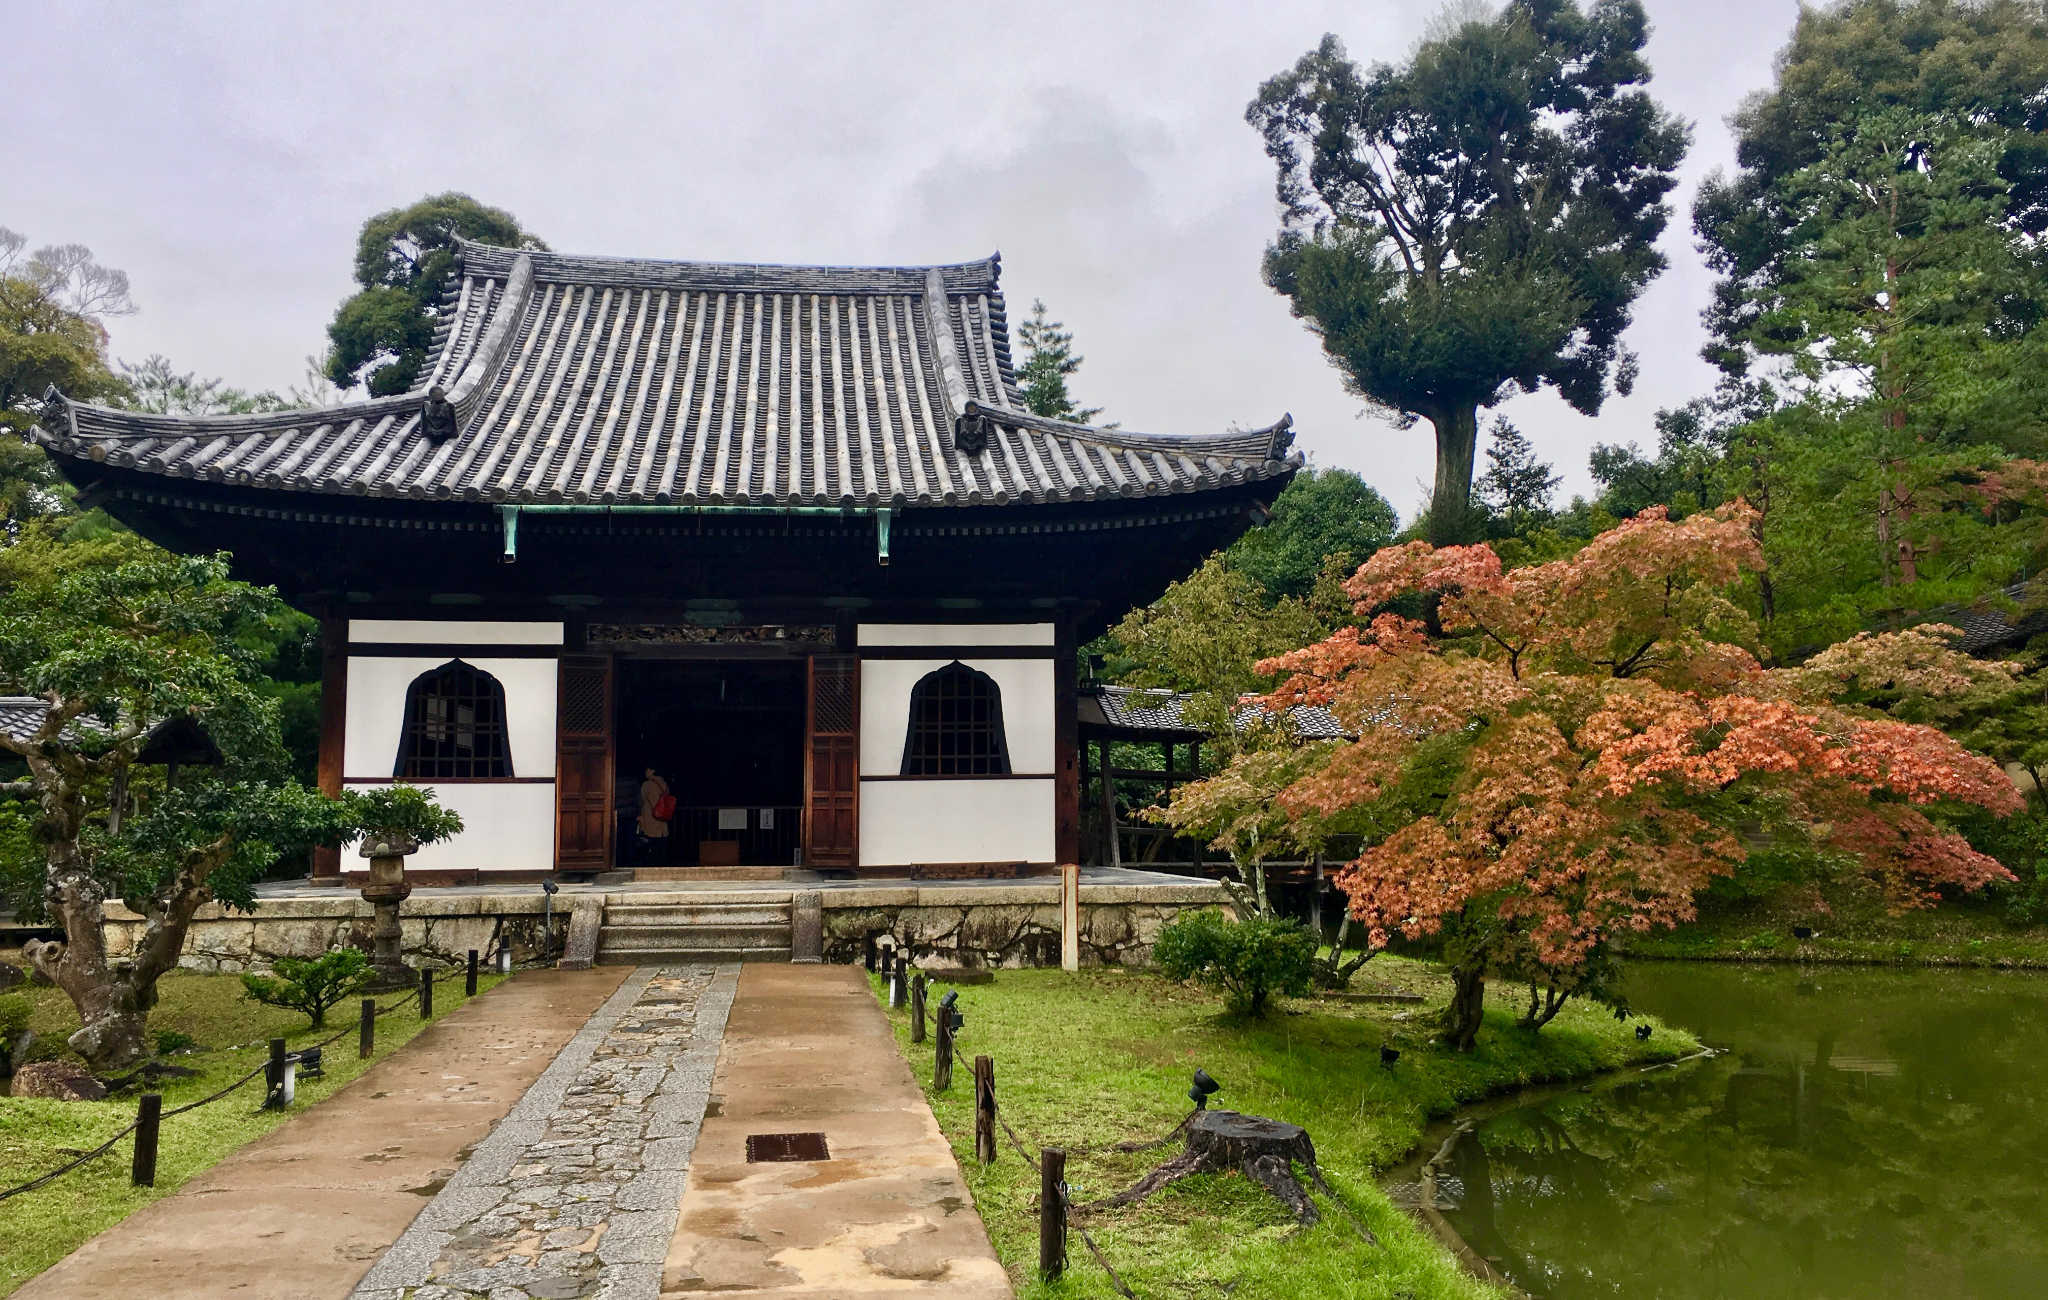 Le petit temple dédié à Toyotomi Hideyoshi et Kita-no-Mandokoro